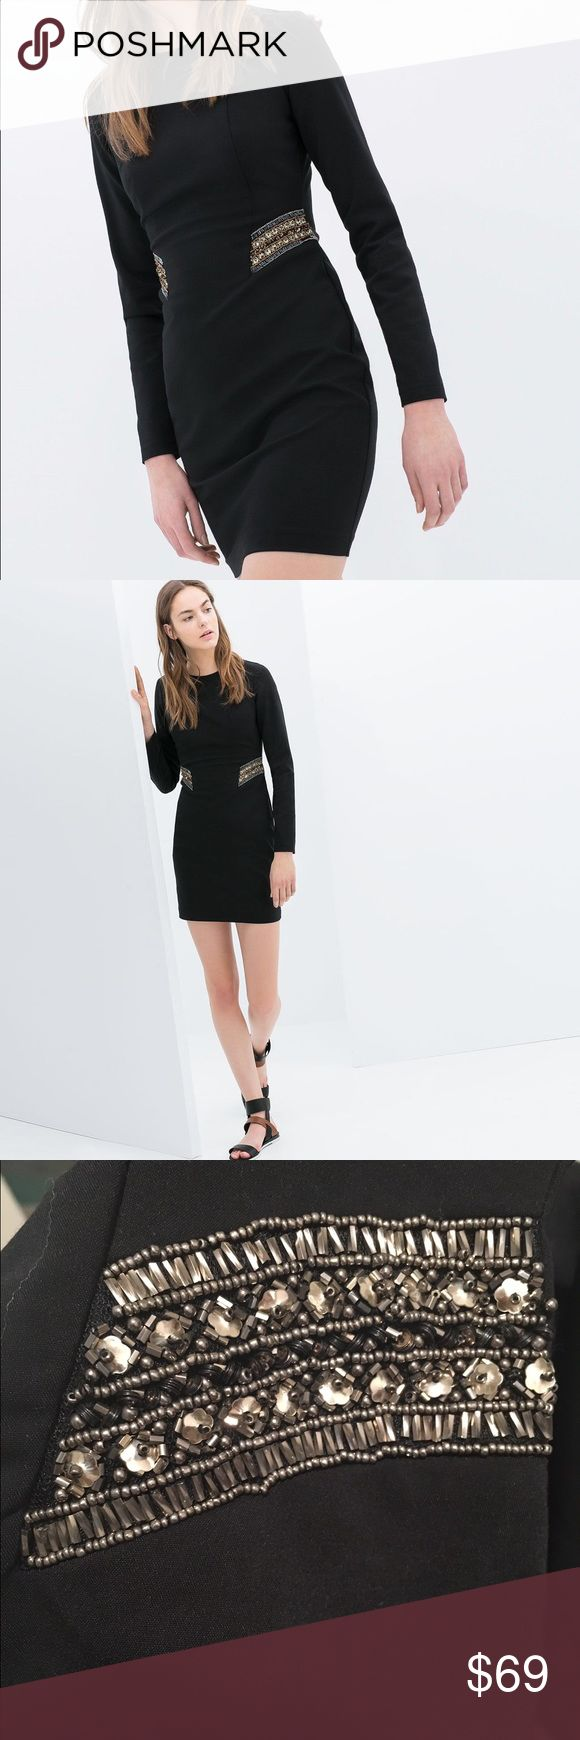 The dress for sale - Zara Beaded Sequin Waist Midi Bodycon Dress Nwt Two Stocksequin Dressbodycon Dressdresses For Salethe